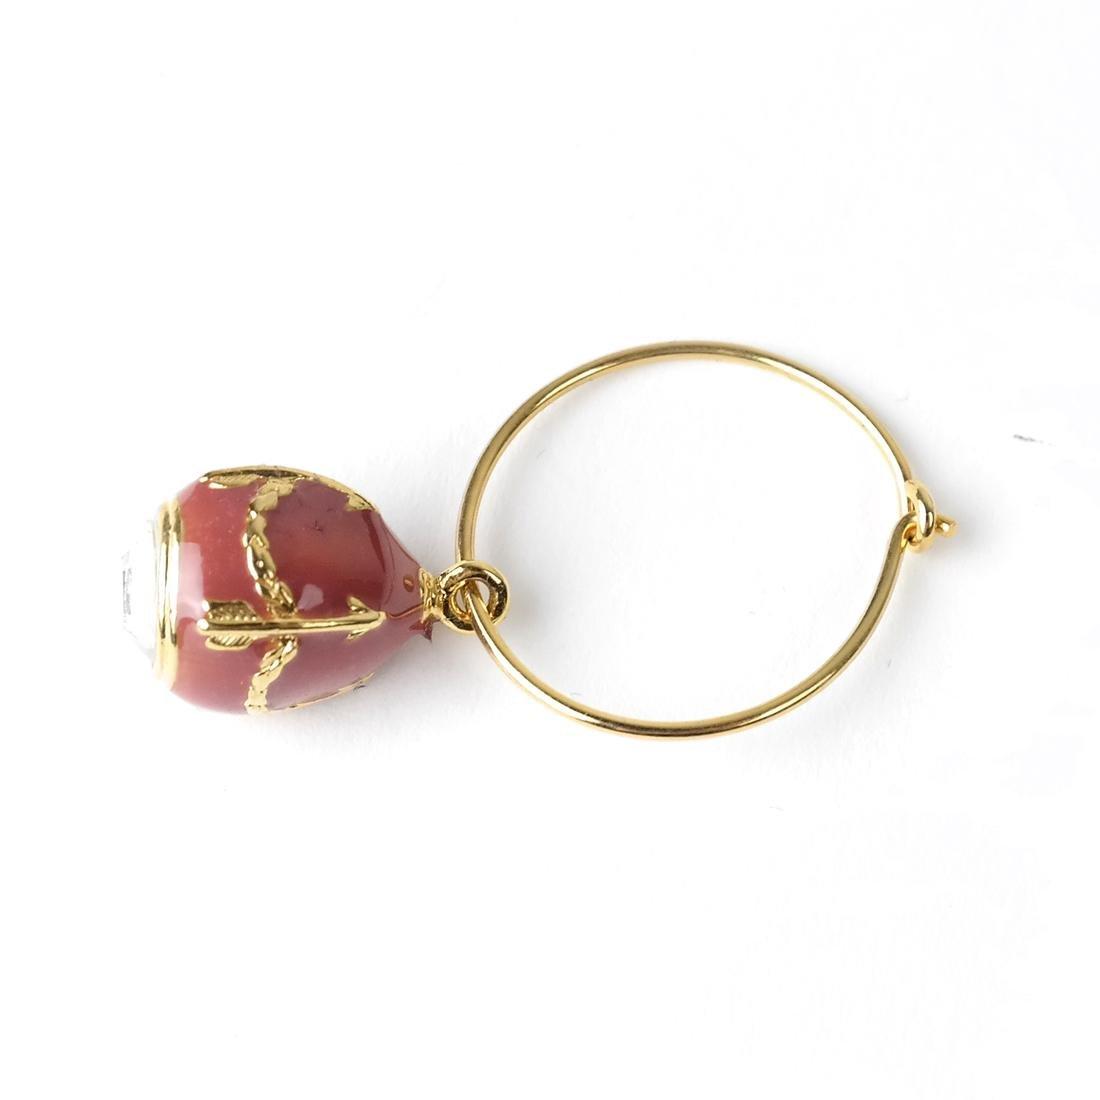 Six Wine Glass Charms, Fabergé - 5